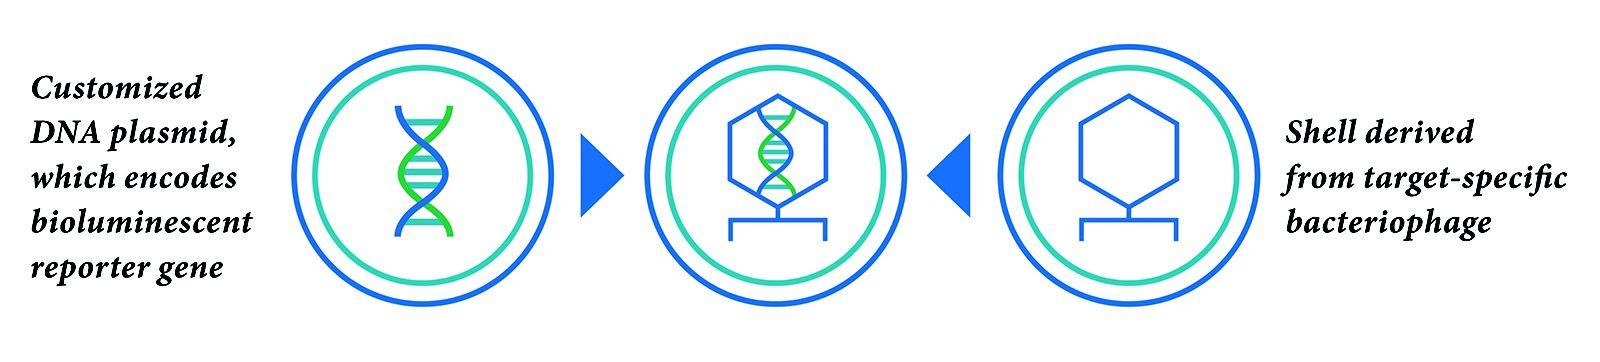 customized-dna-plasmid